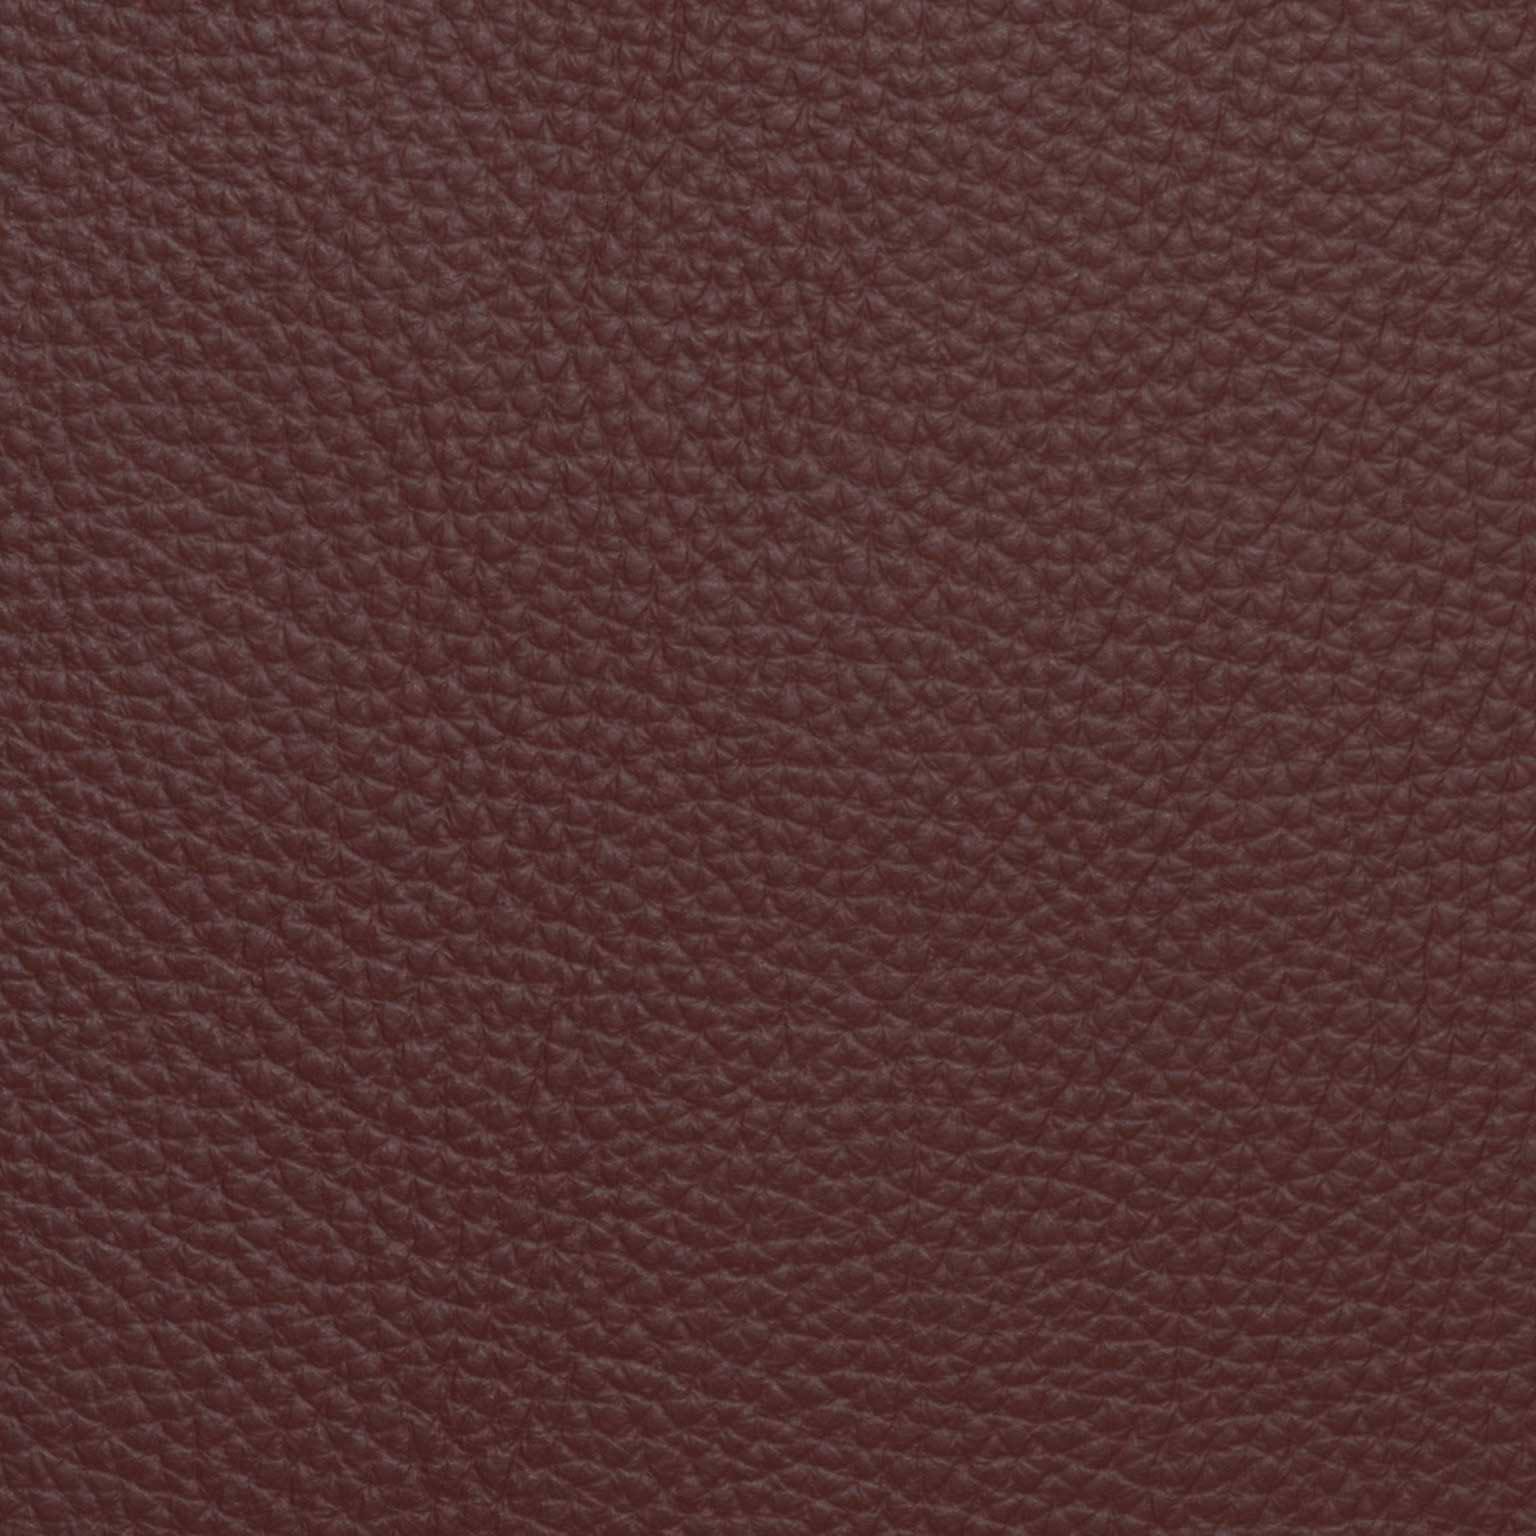 Ranchio leather_p11-074